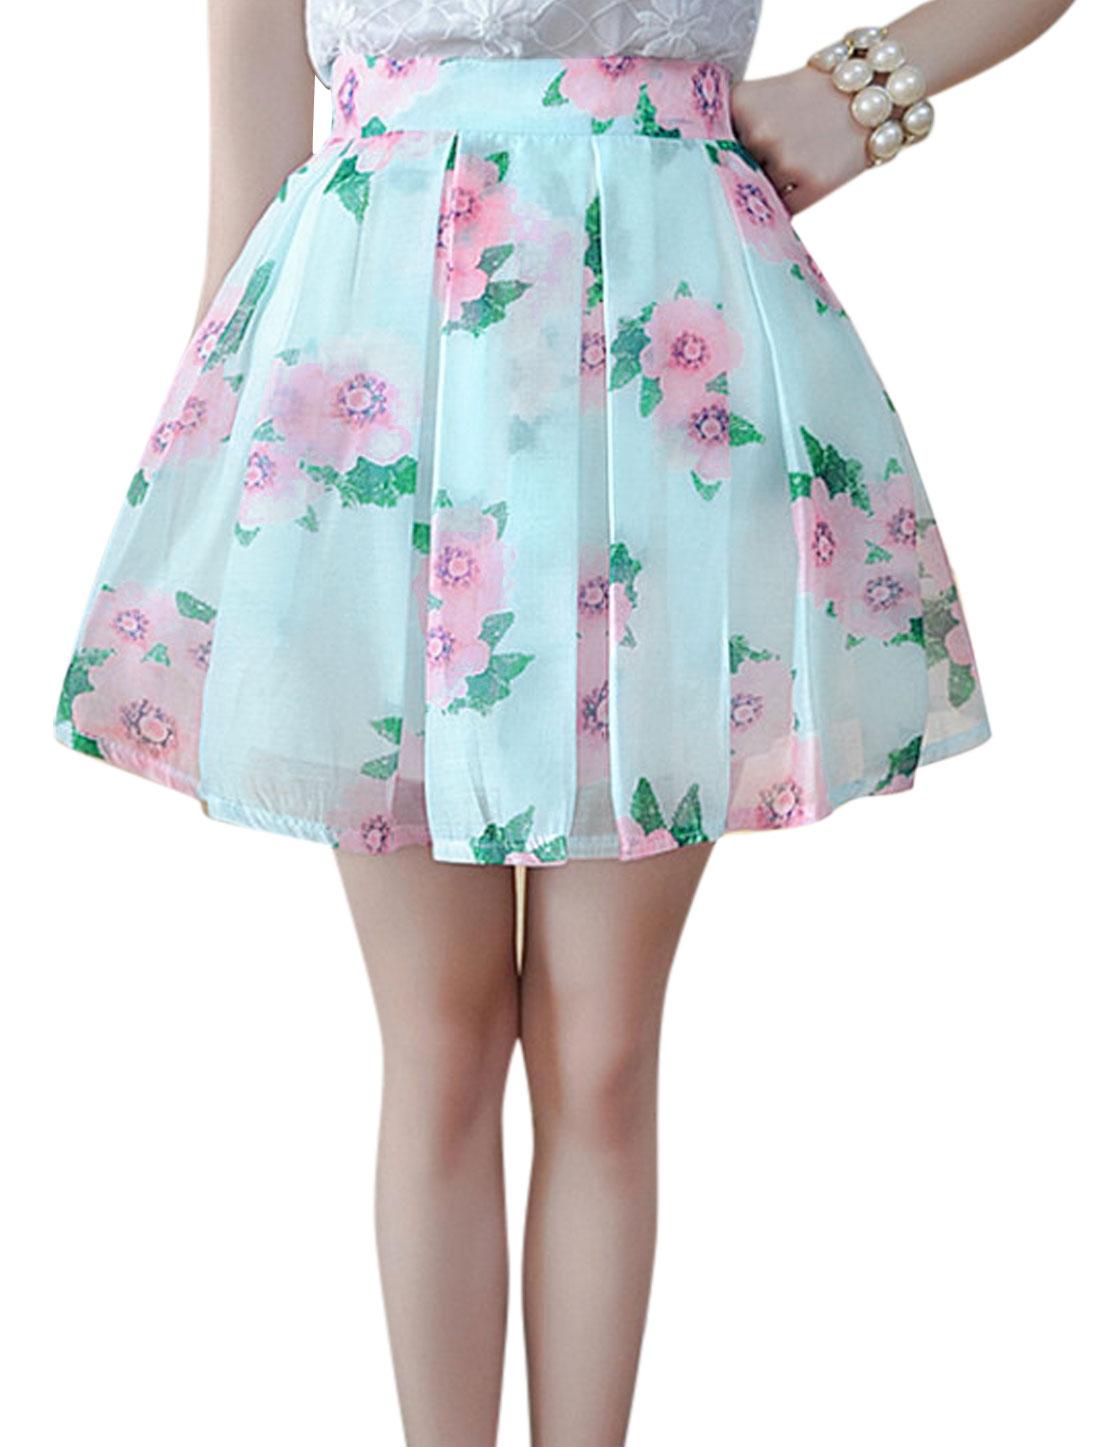 Lady Elastic Waist Floral Prints Plaids Design Organza Full Skirt Pink Mint S